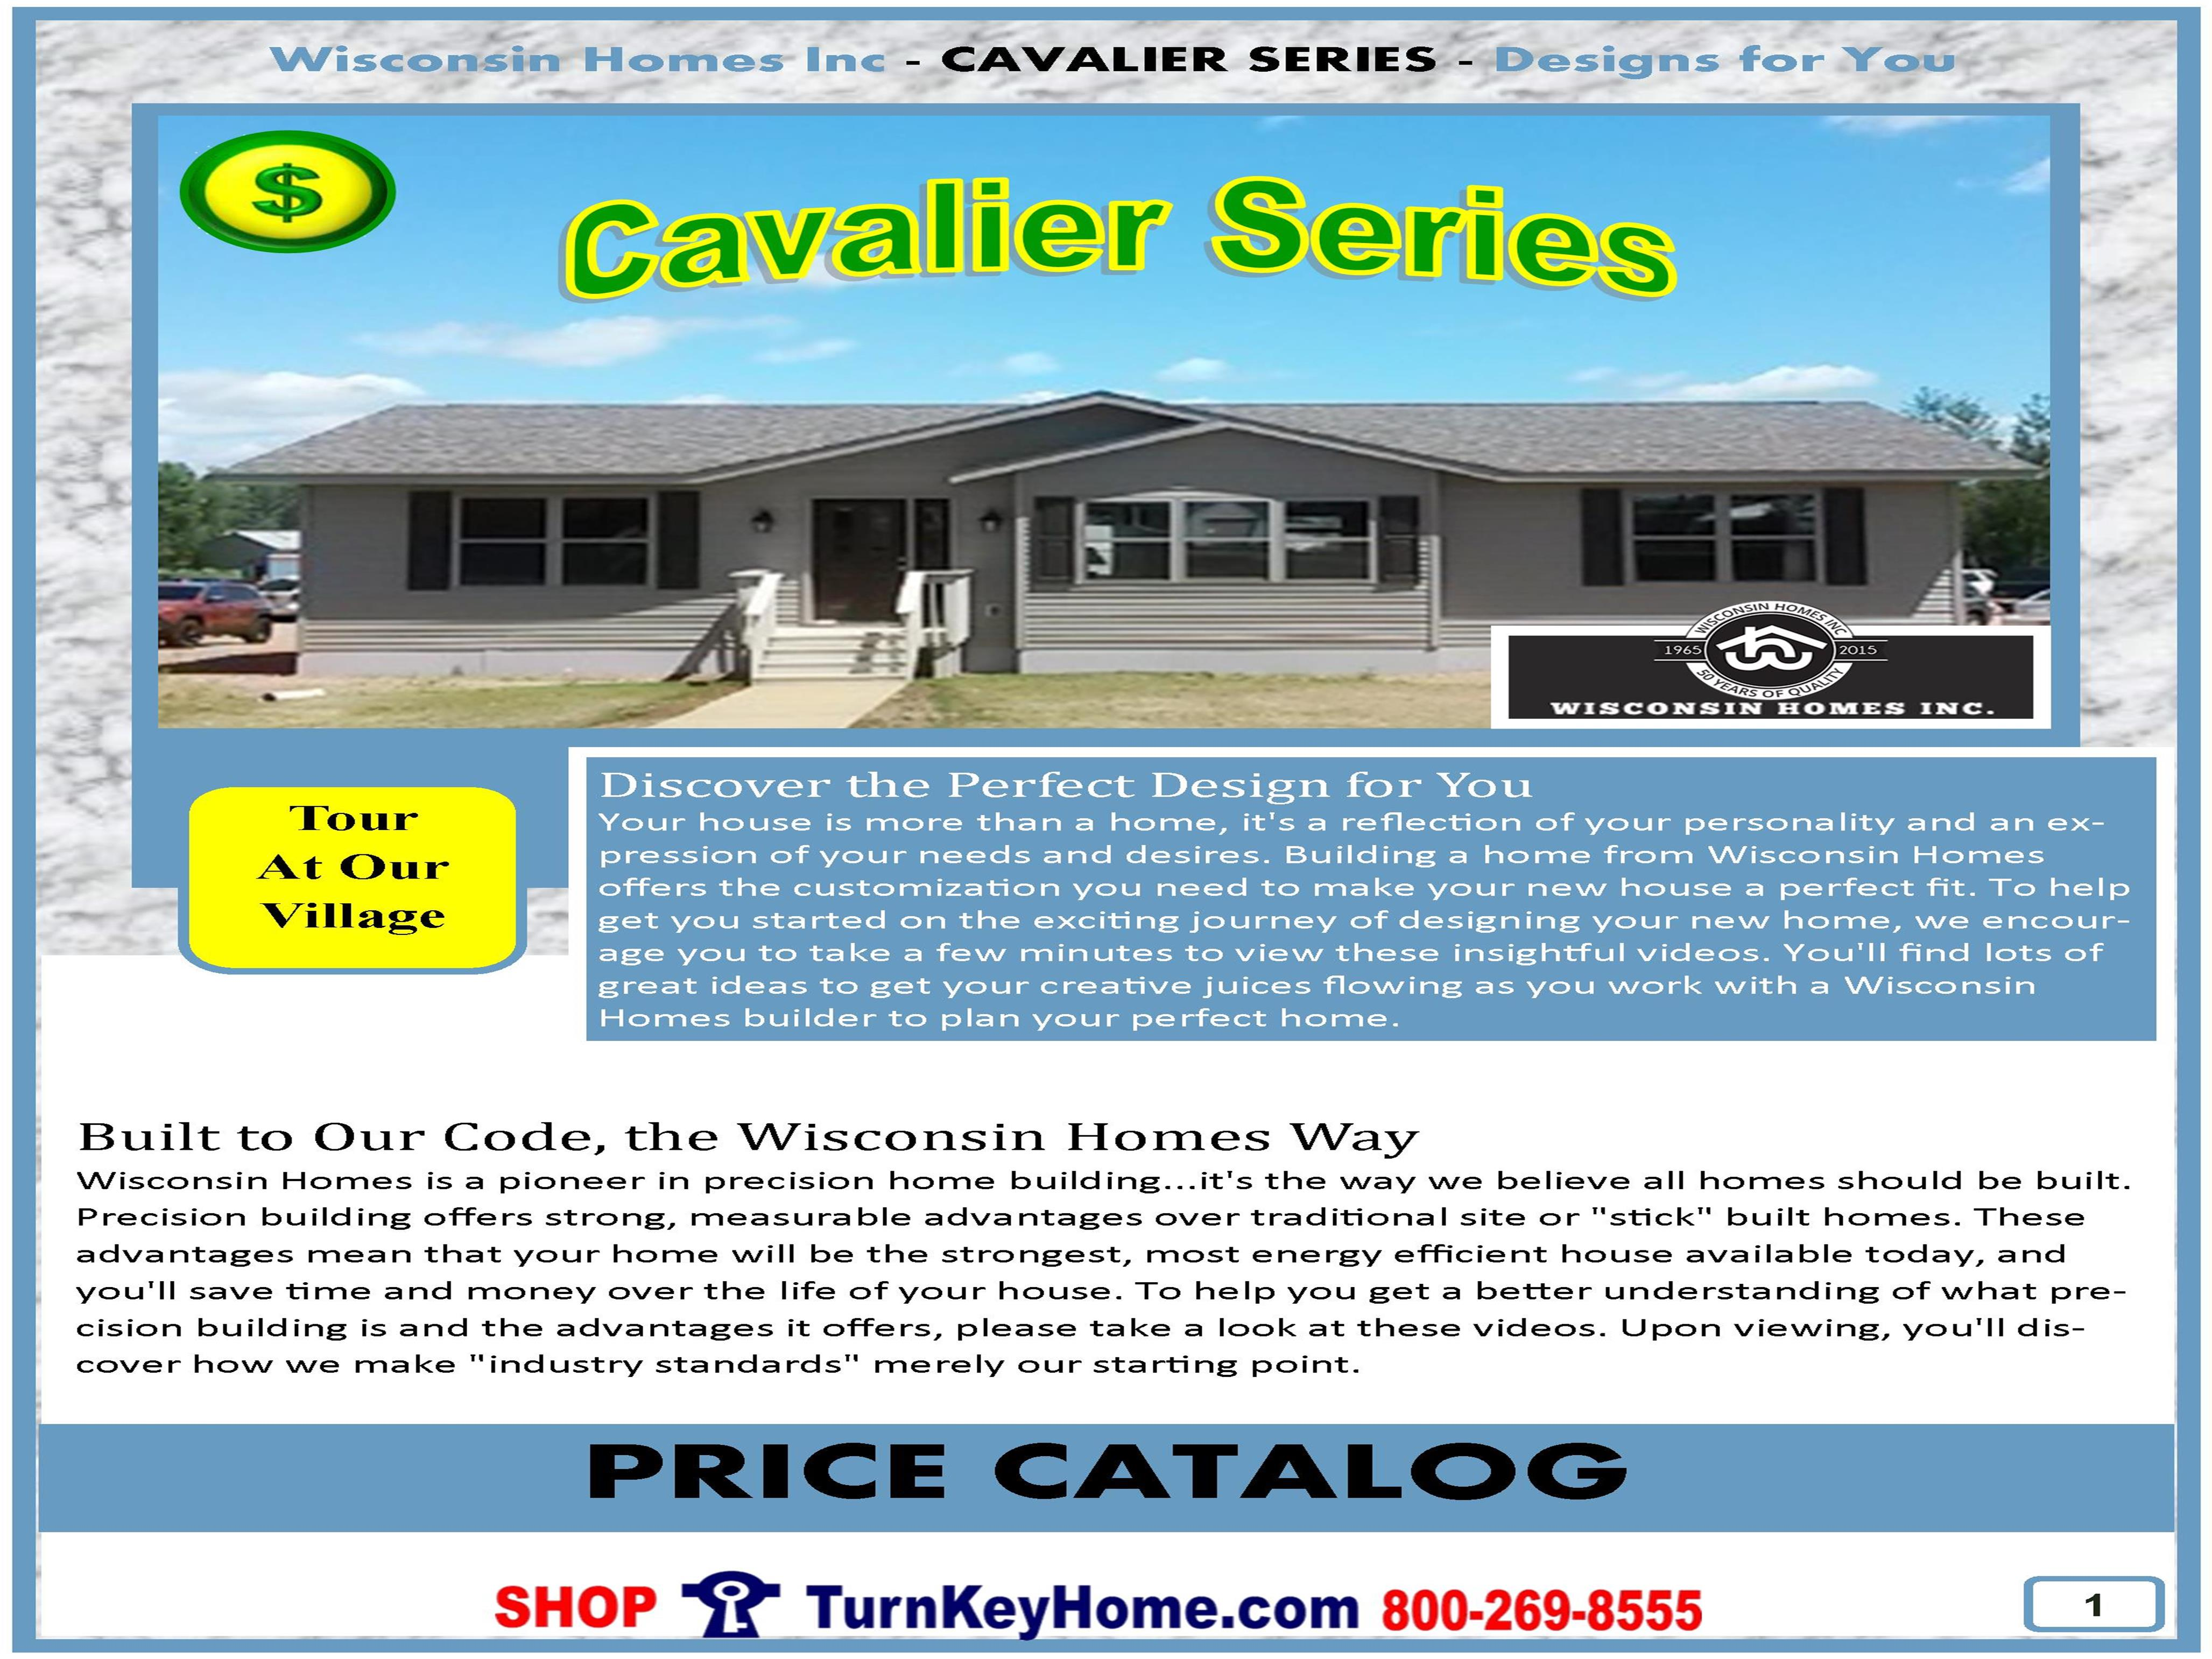 wisconsin homes inc cavalier series catalog